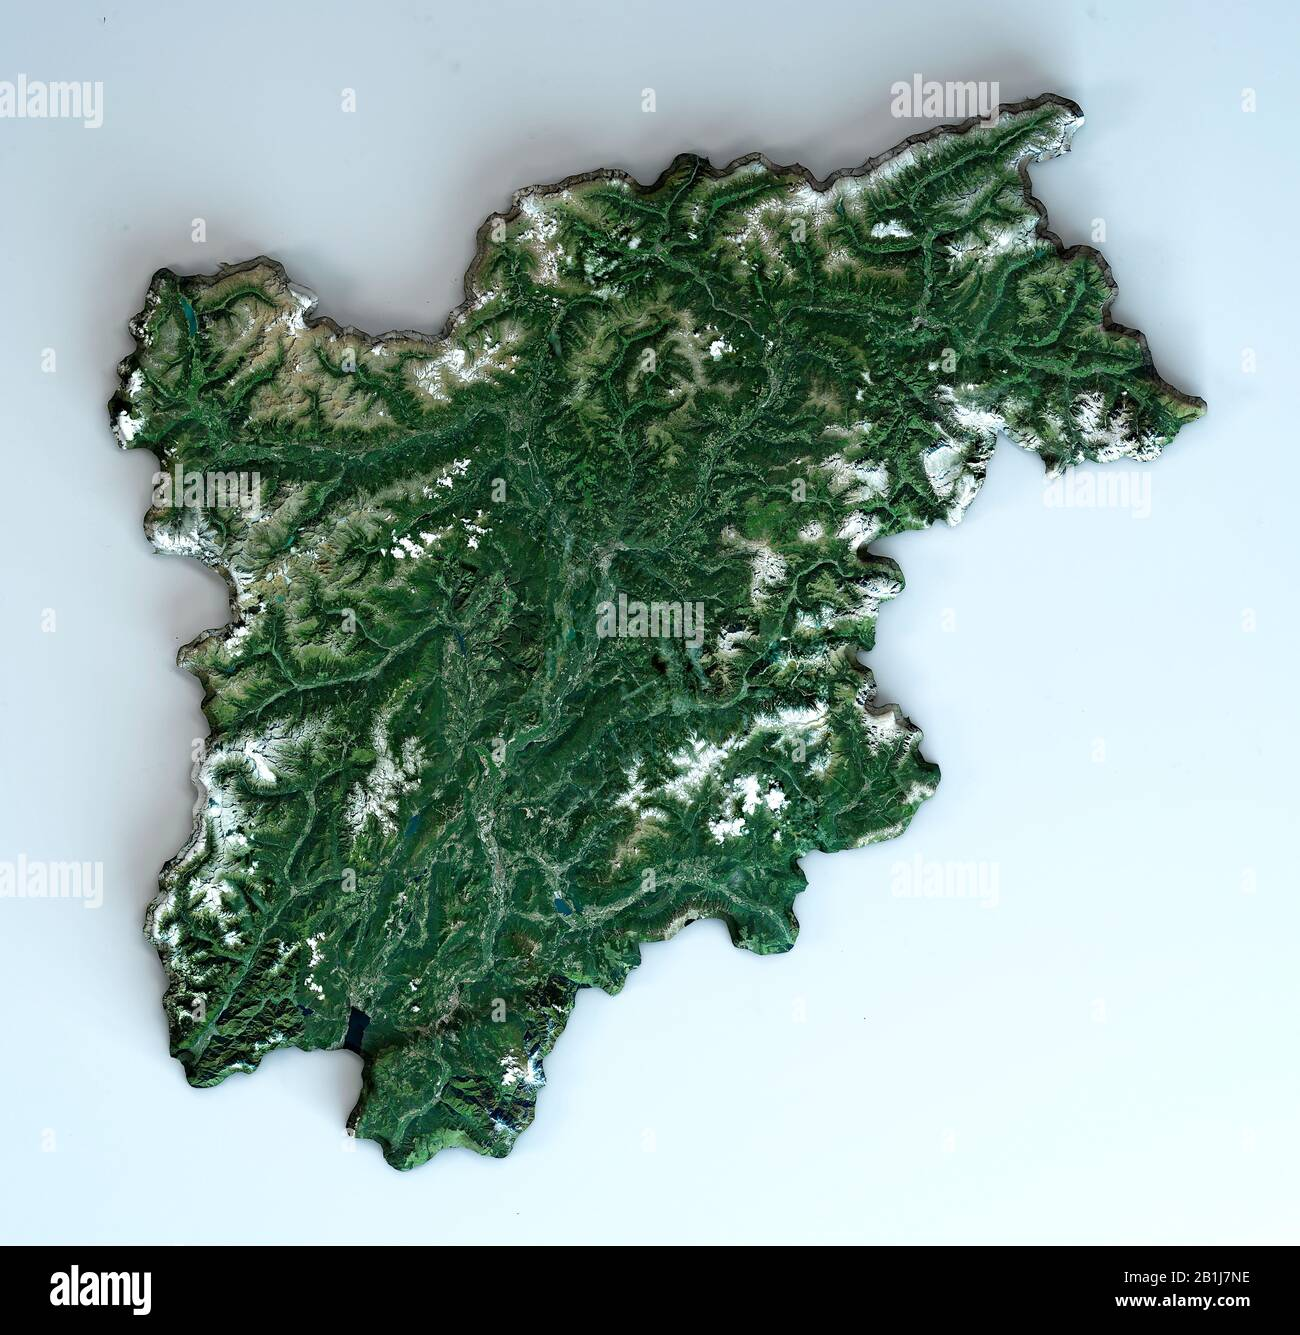 Trentino Alto Adige Cartina Fisica E Politica.Bolzano Map High Resolution Stock Photography And Images Alamy